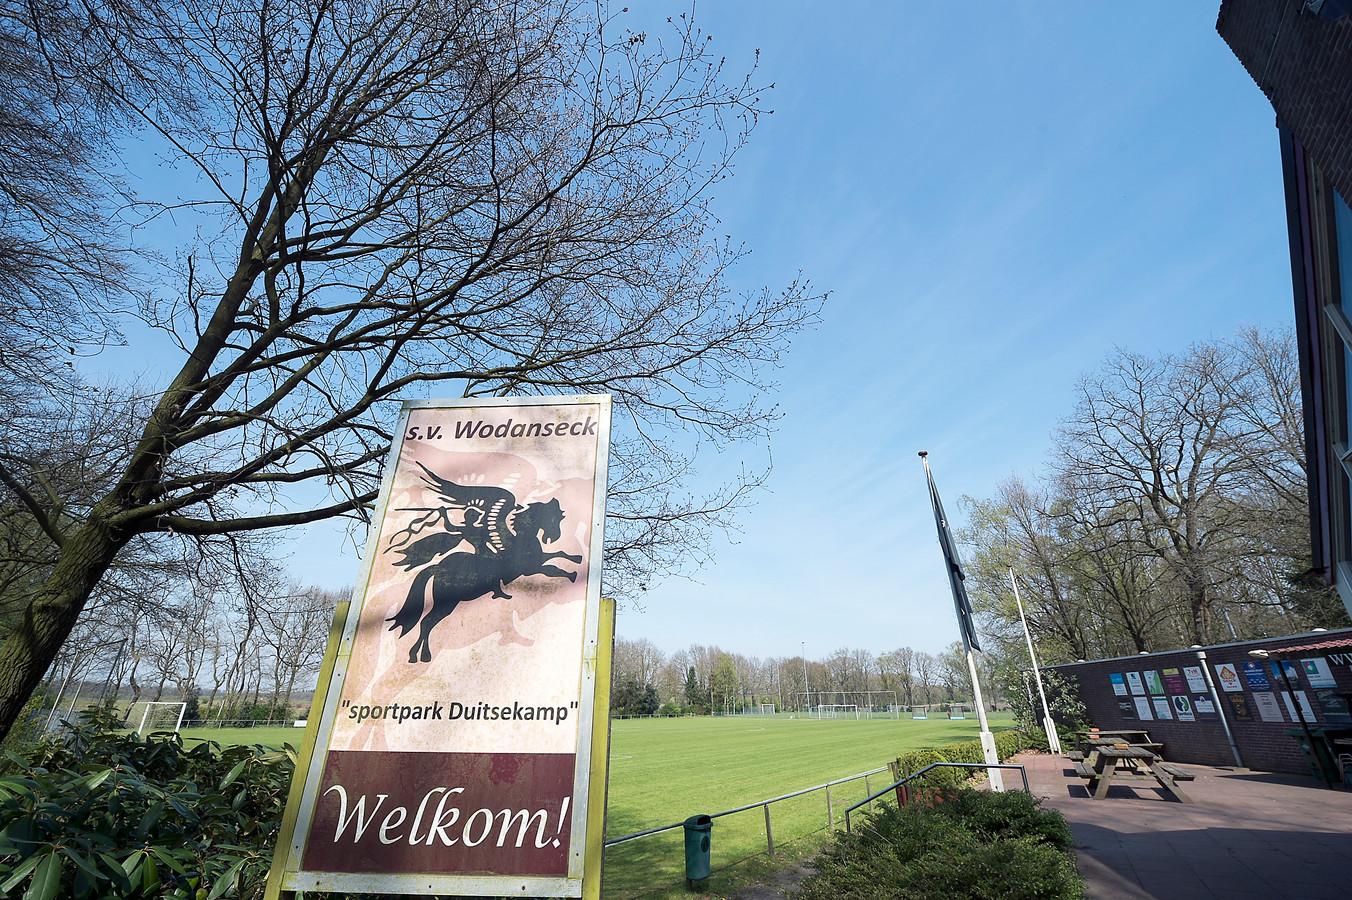 Wodanseck-DVOV: gestaakte vanwege invallende duisternis.